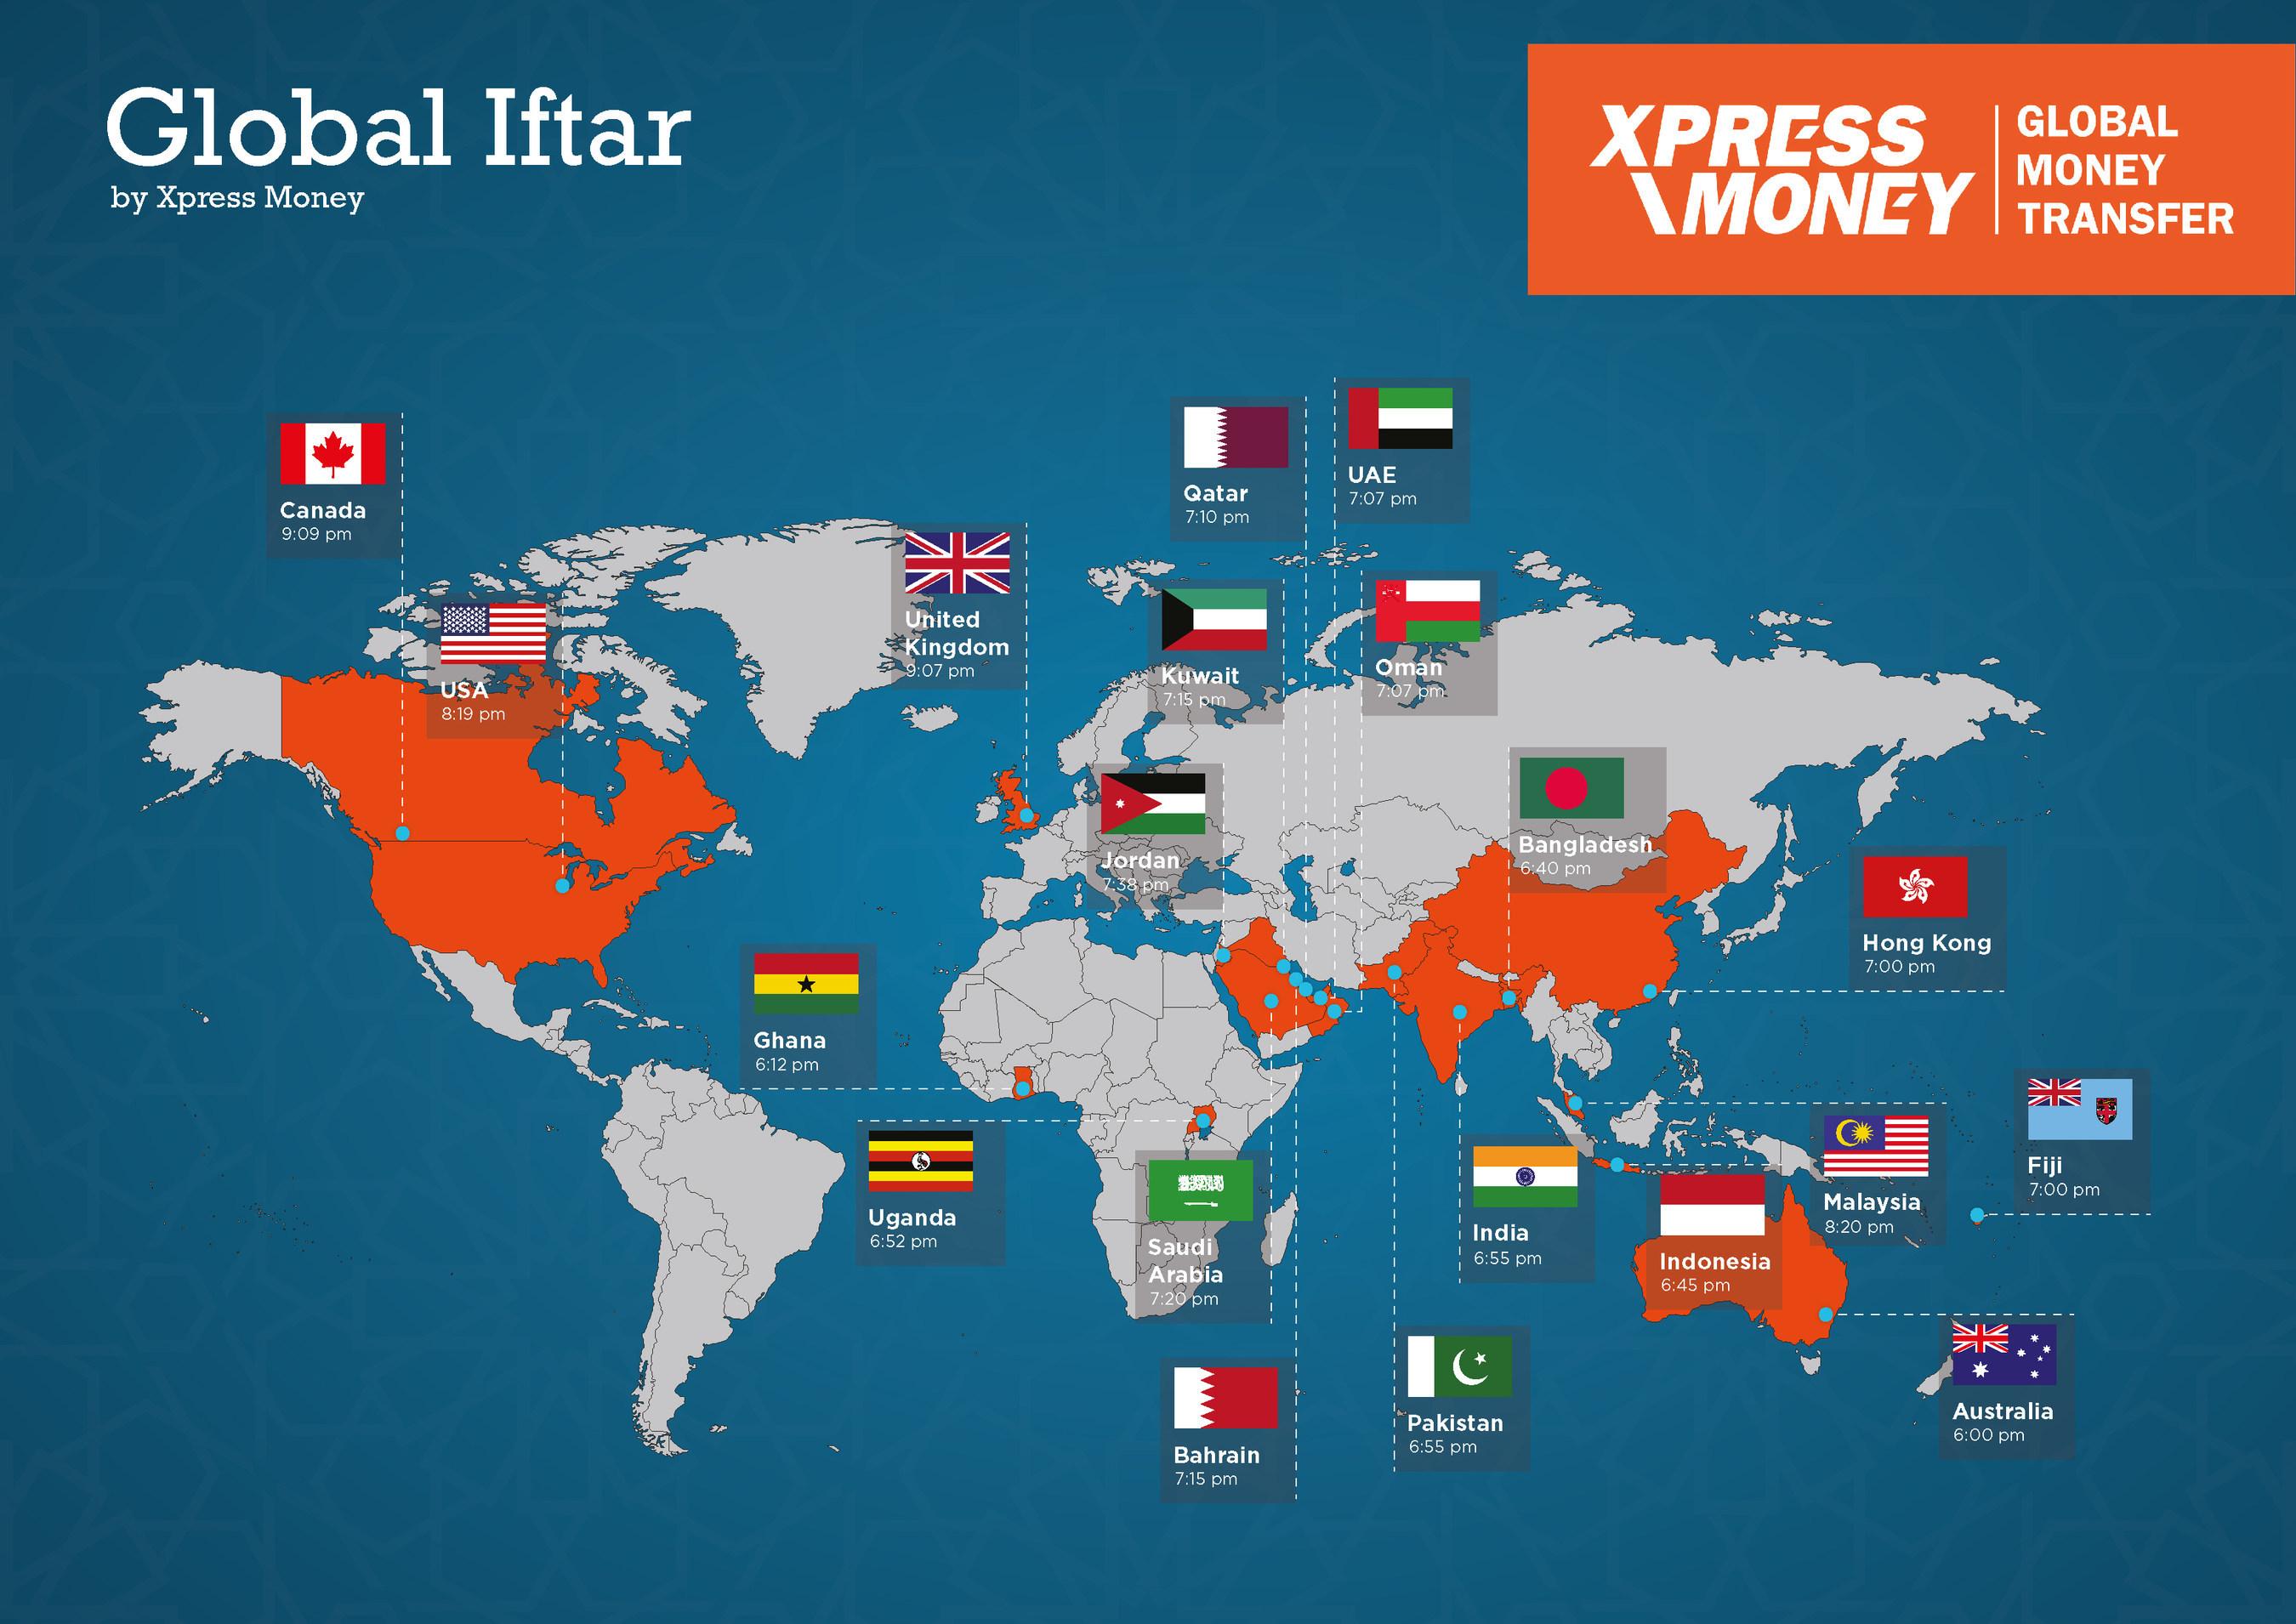 Global Iftar (PRNewsfoto/Xpress Money)